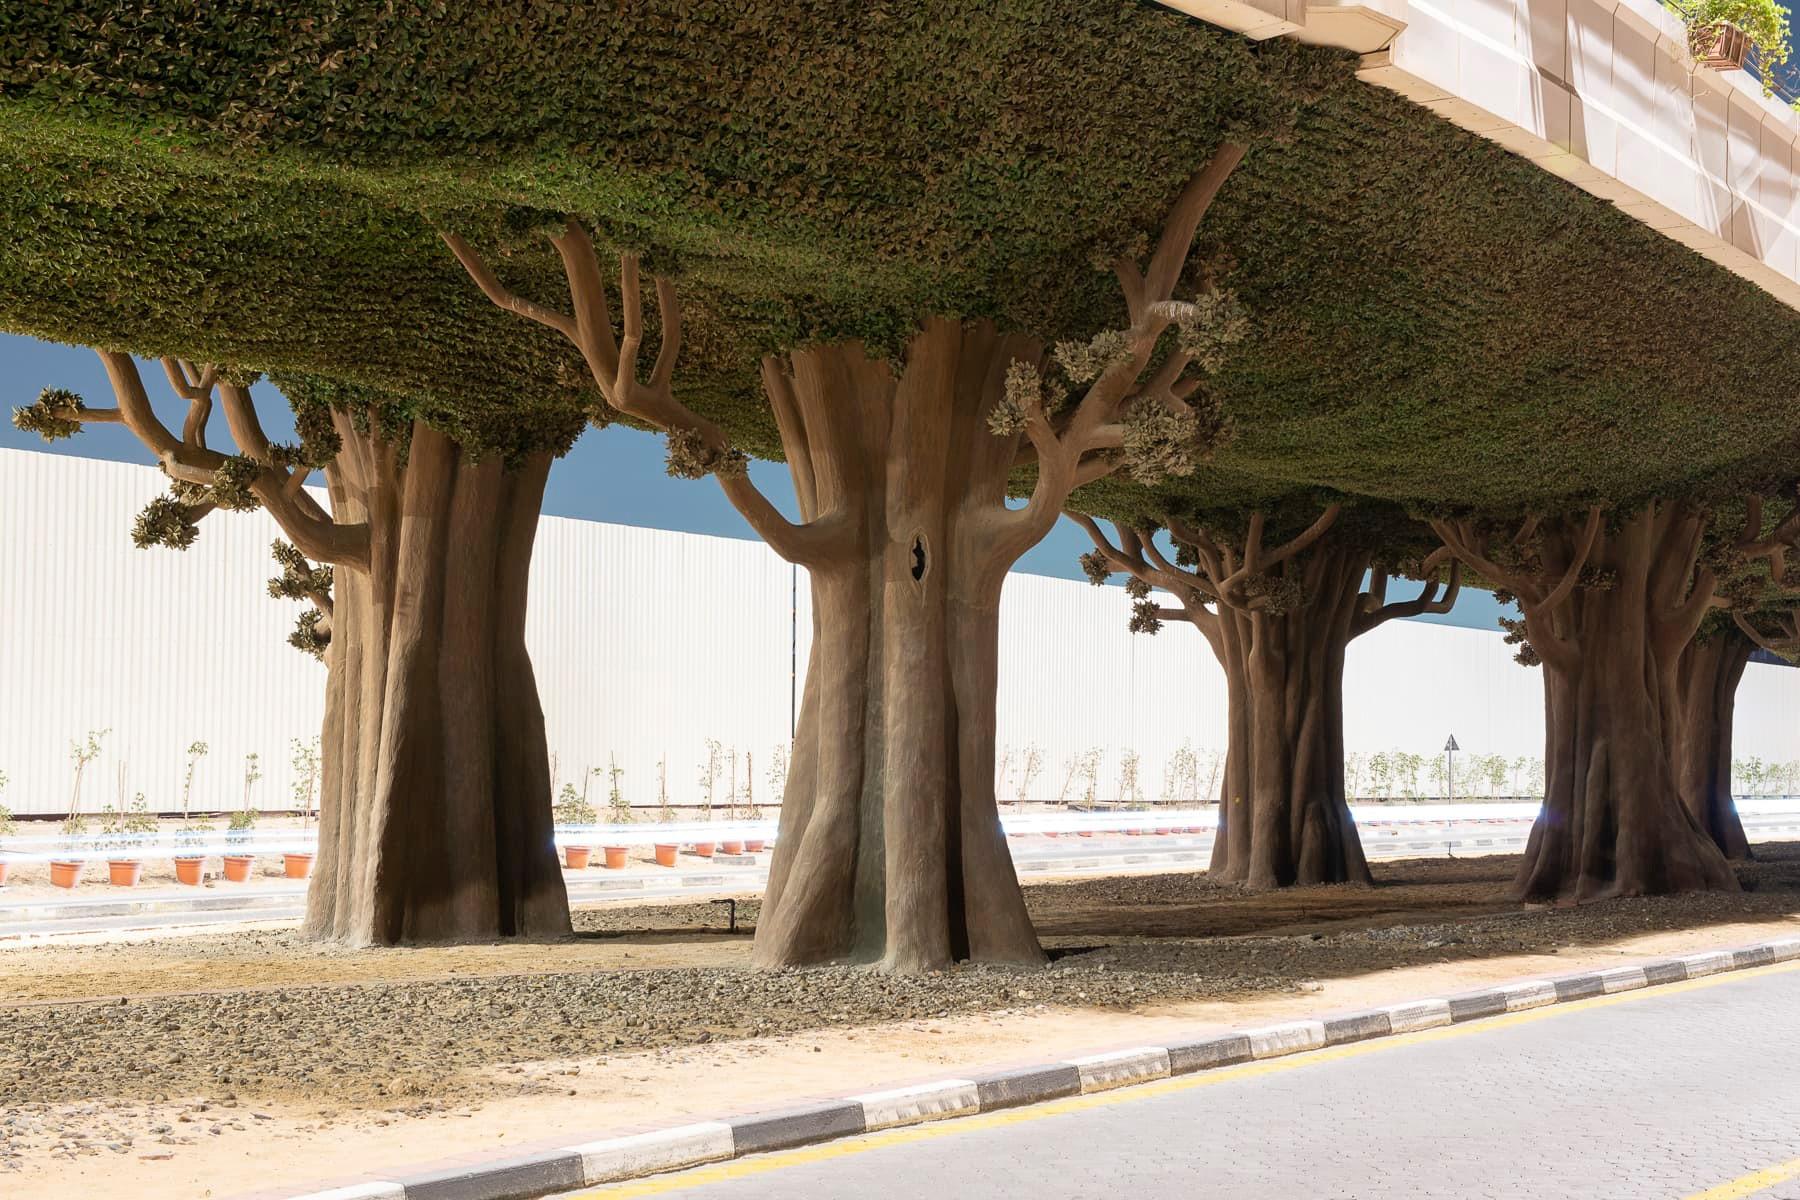 fabianschroder-in_natura-trees.jpg